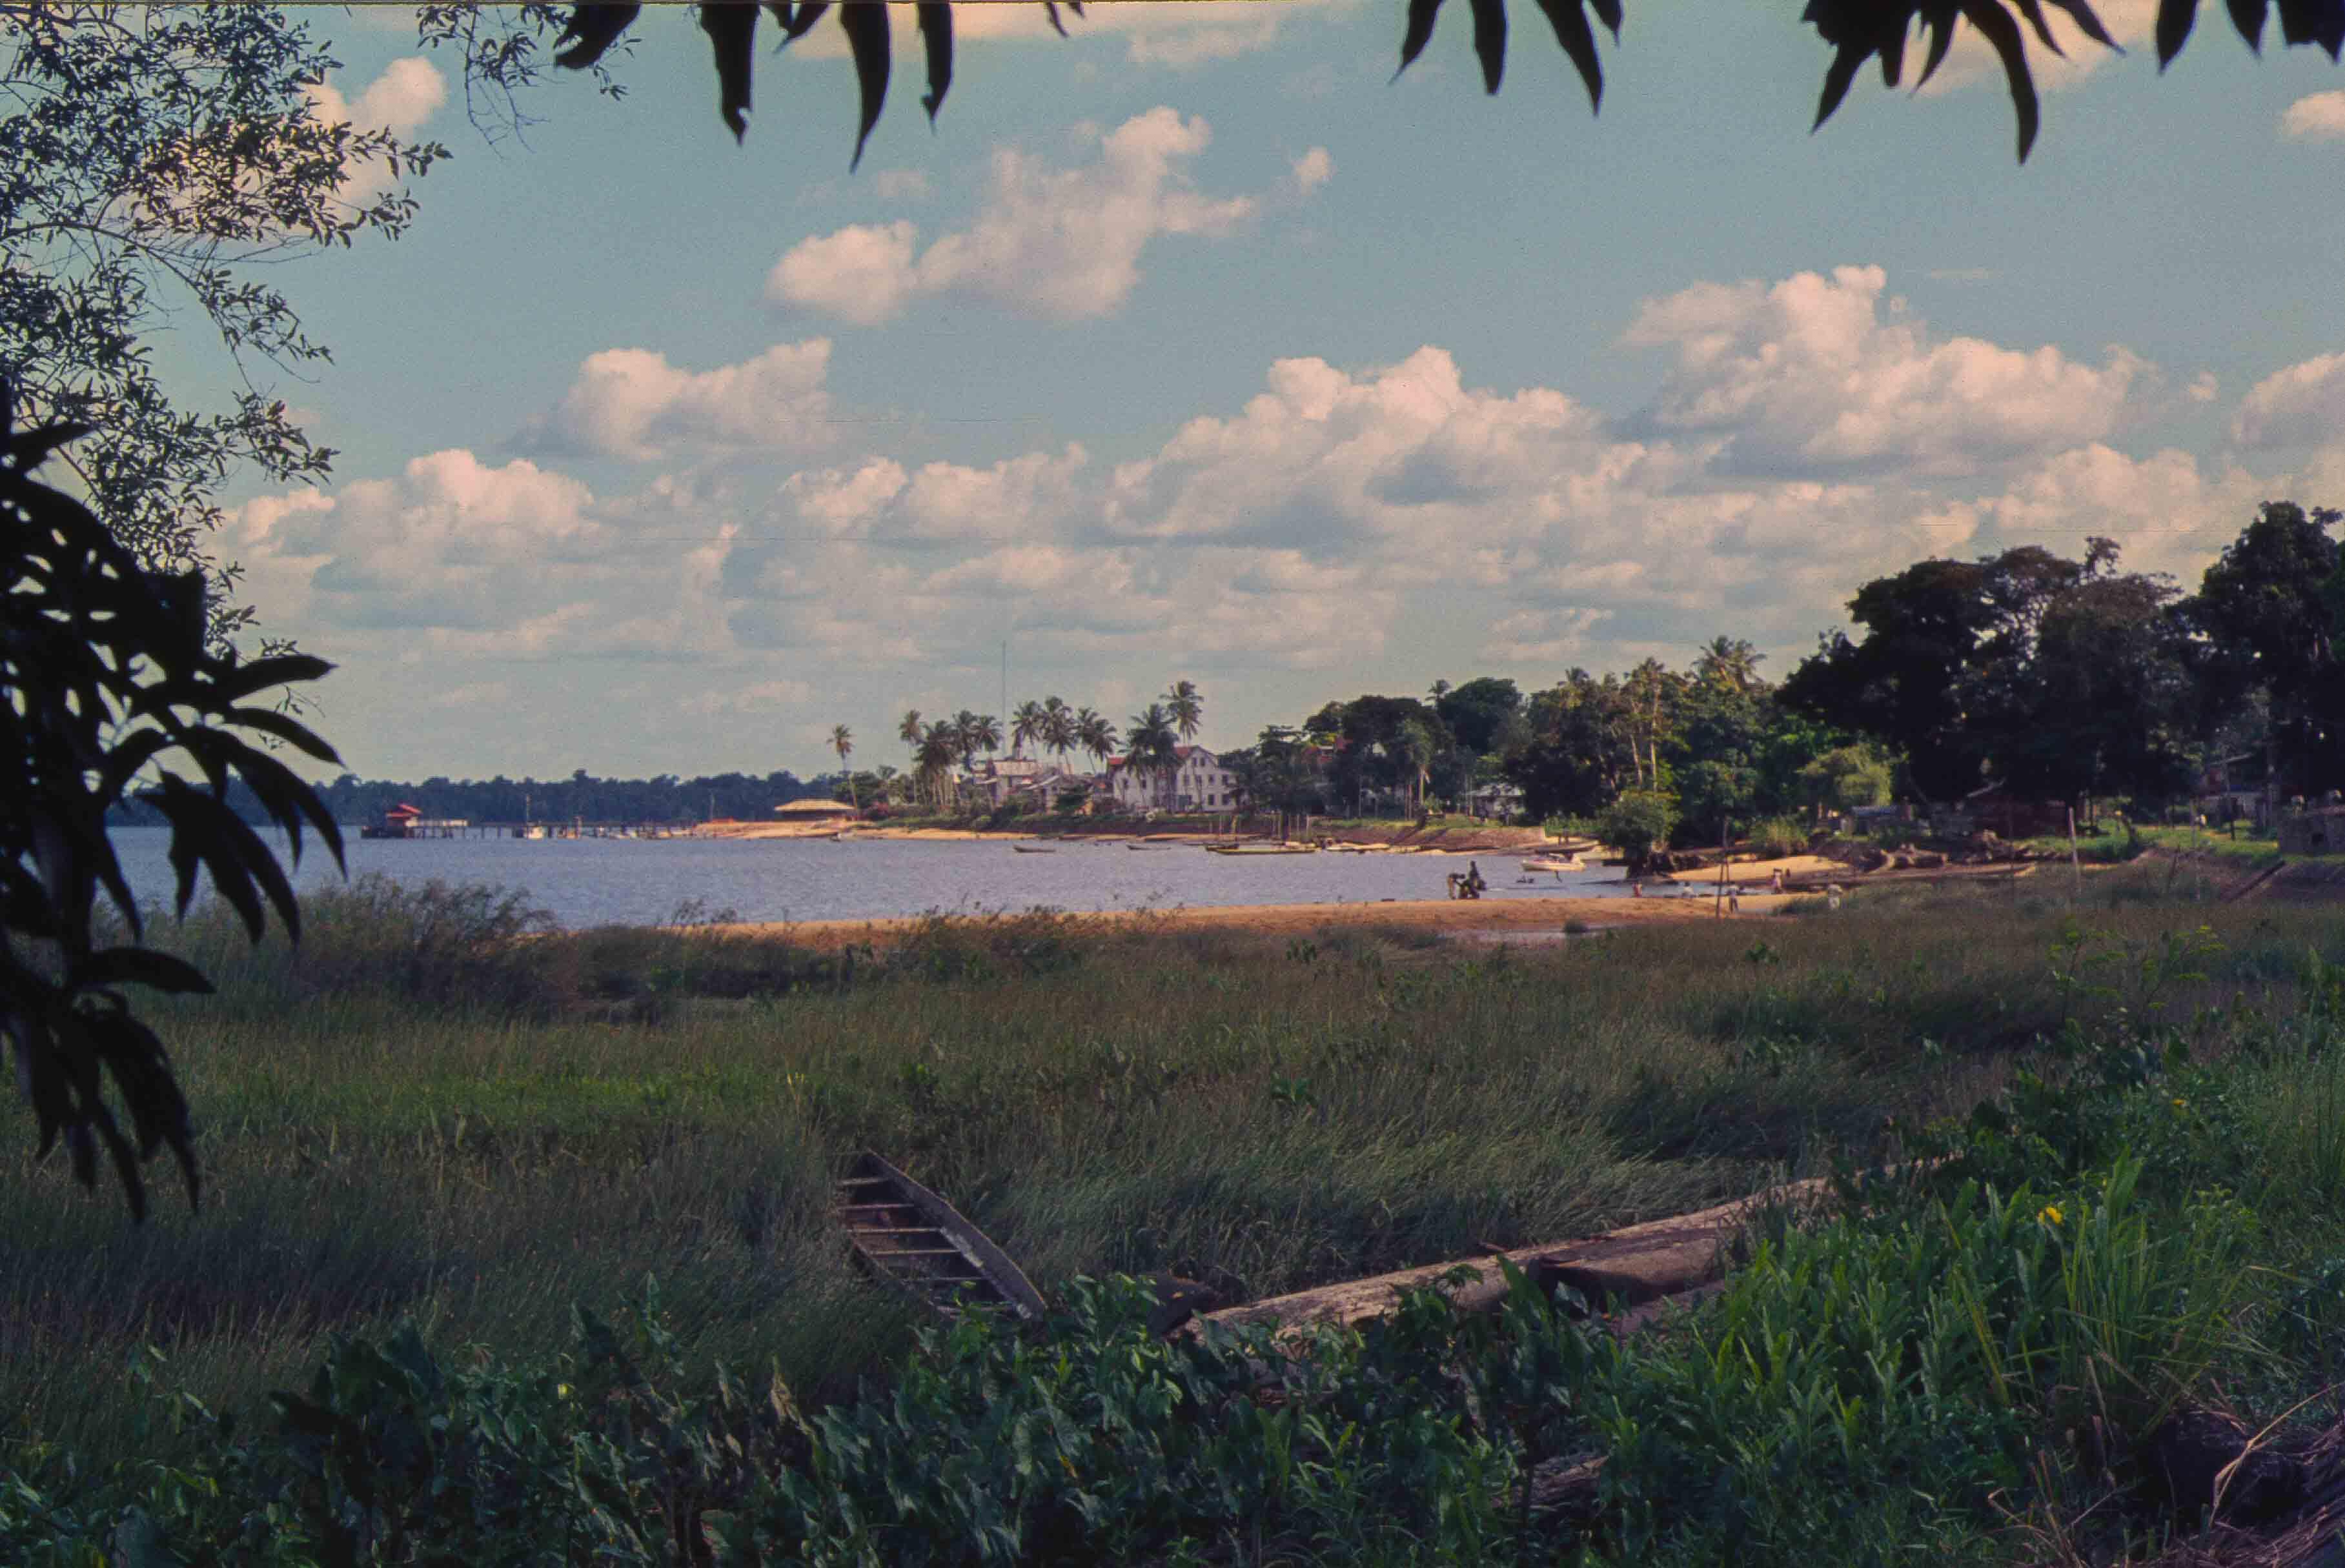 389. Suriname